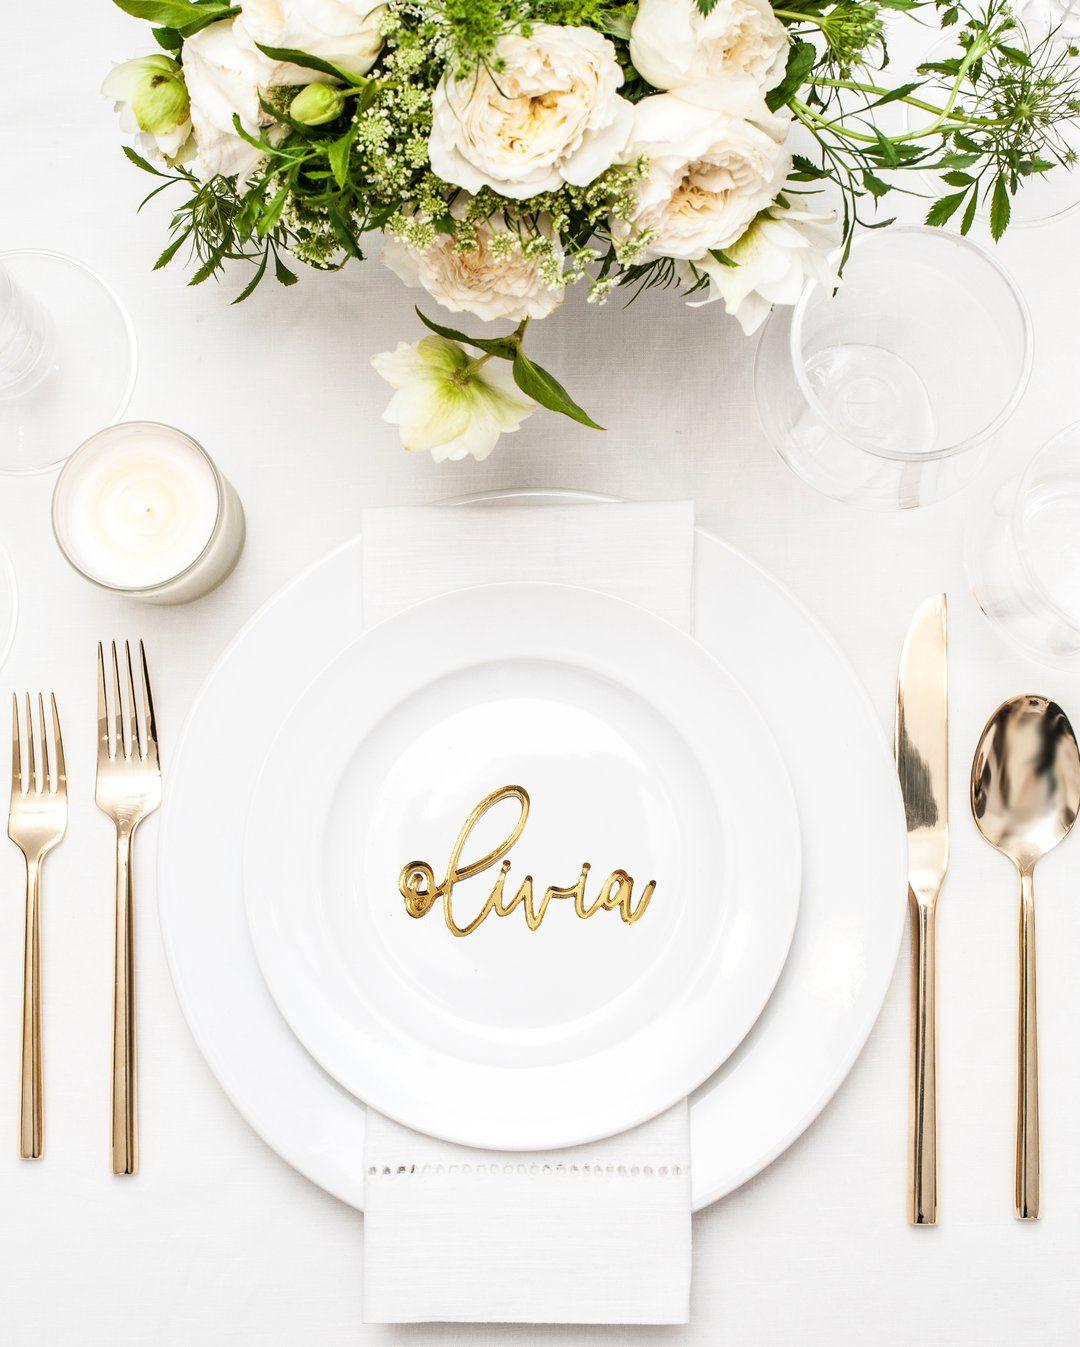 Wedding Place Names Wedding Table Decor Custom Wood Wedding Birthday Place Tags Names Wedding Name Tags Wedding Decor Geometric Names